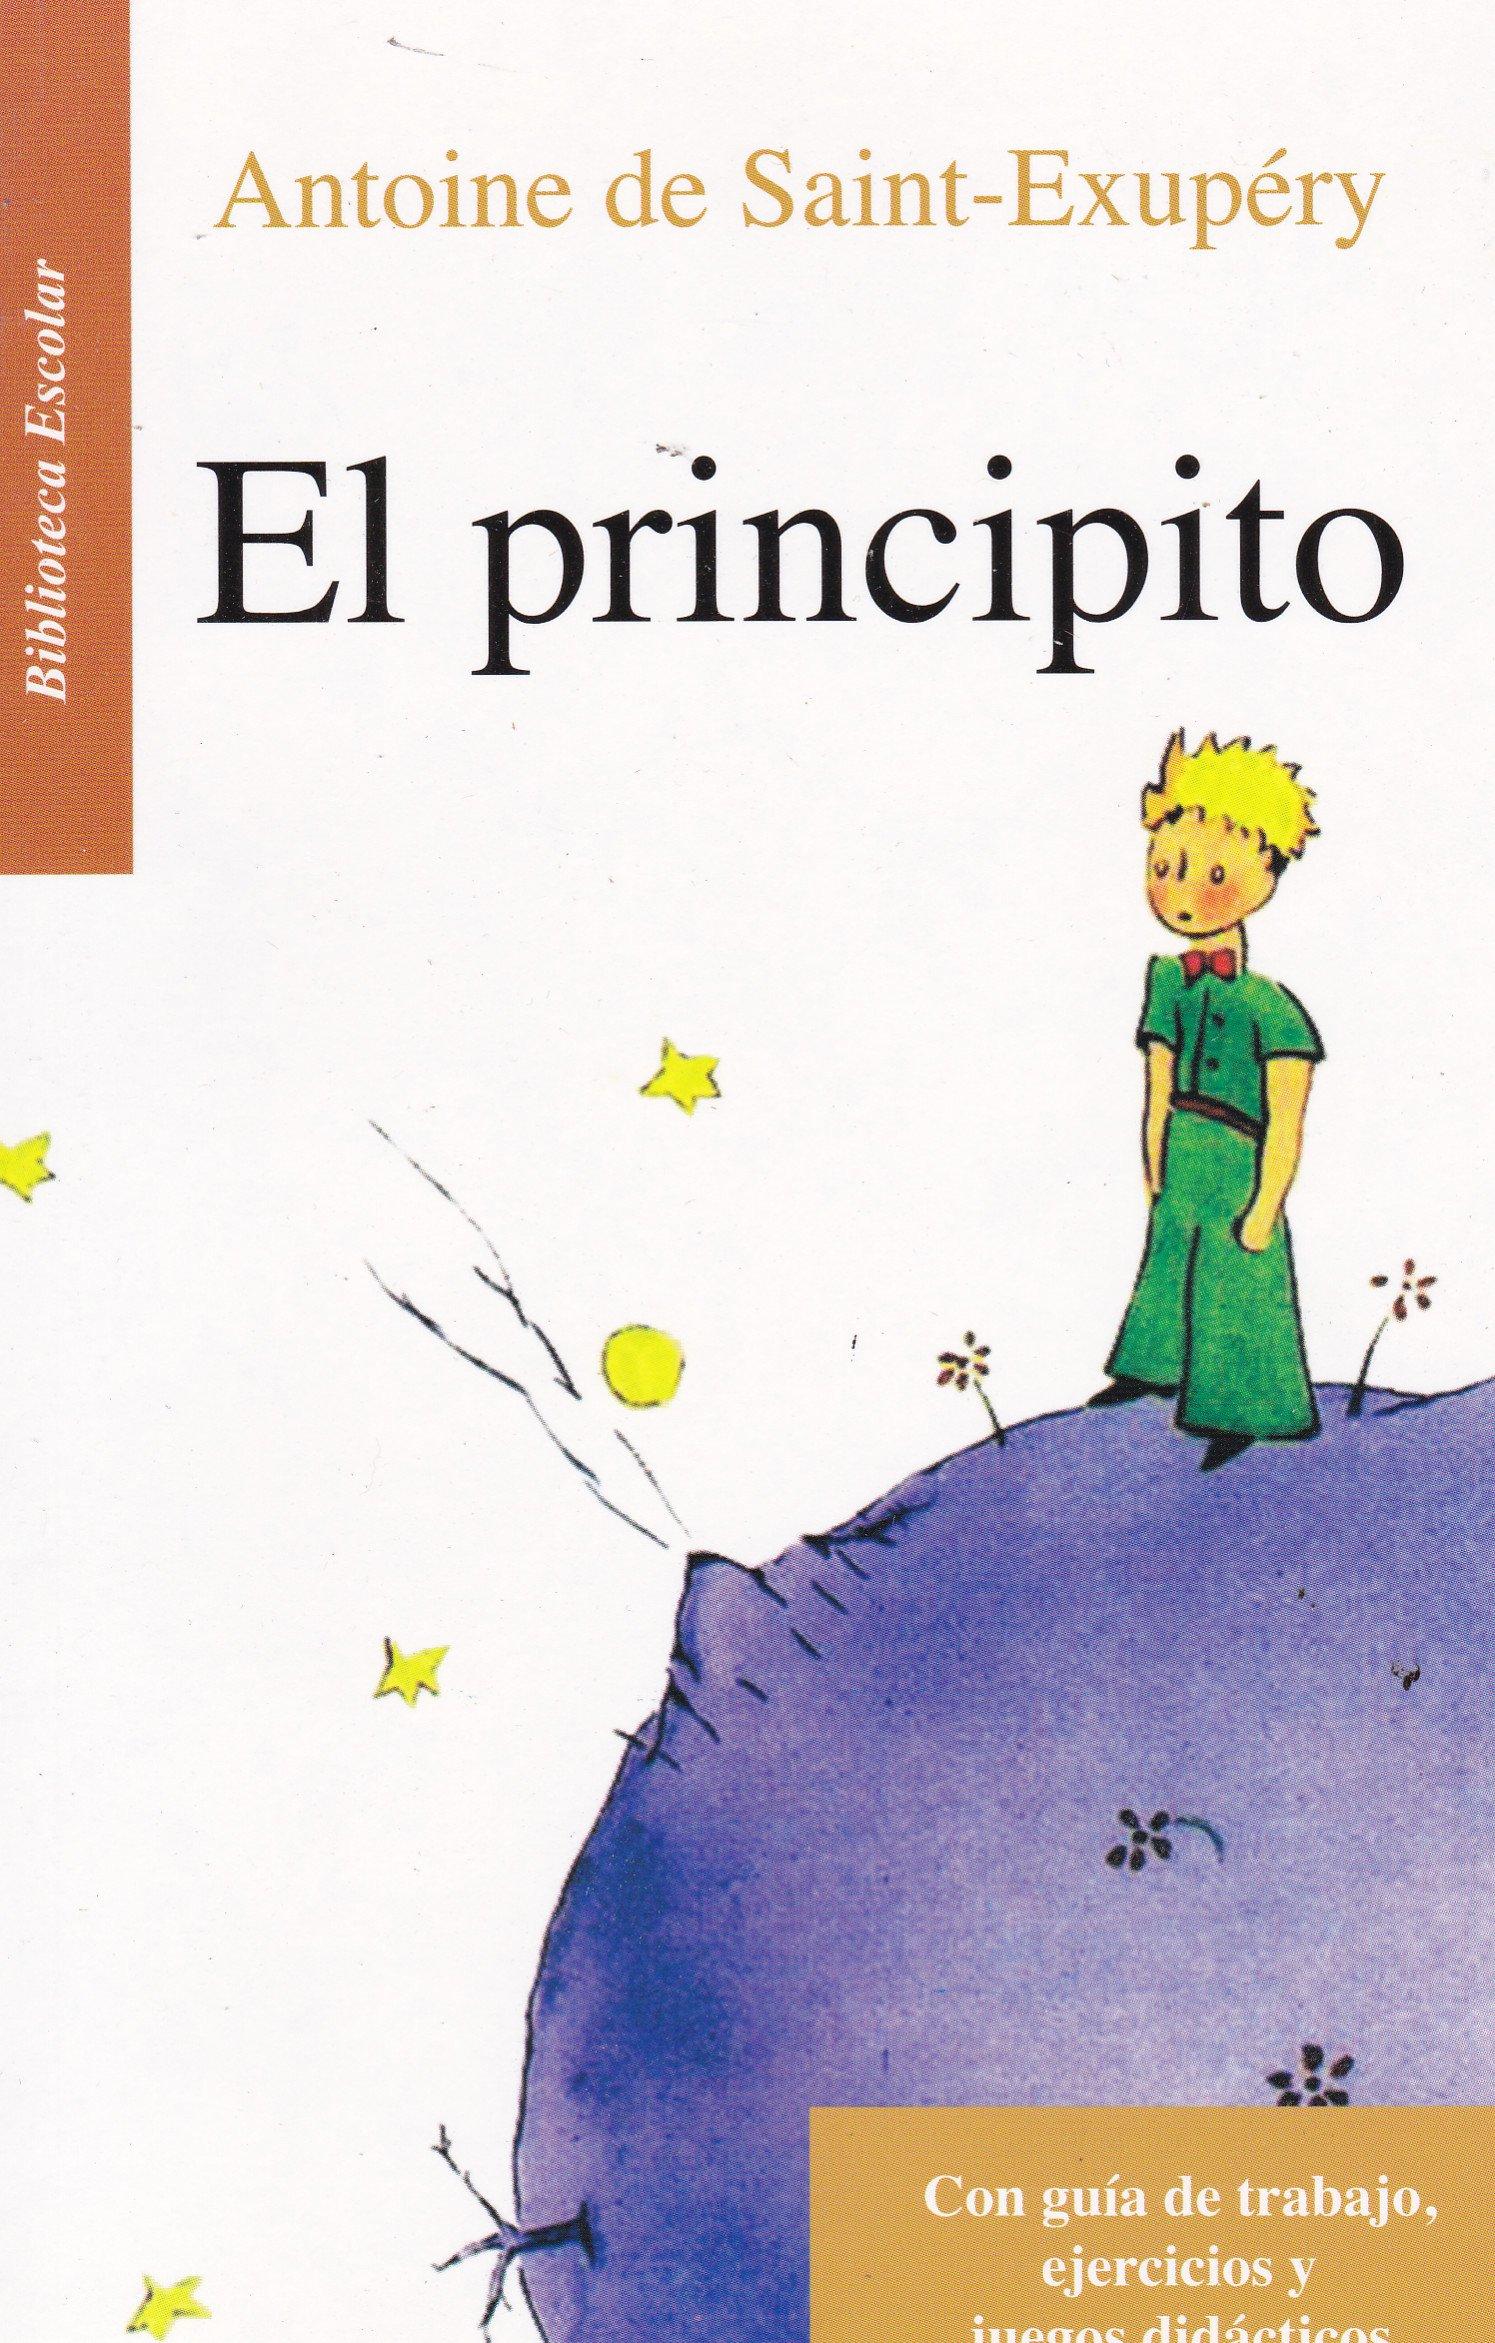 El principito (Spanish Edition) (Spanish) Paperback – January 1, 2014